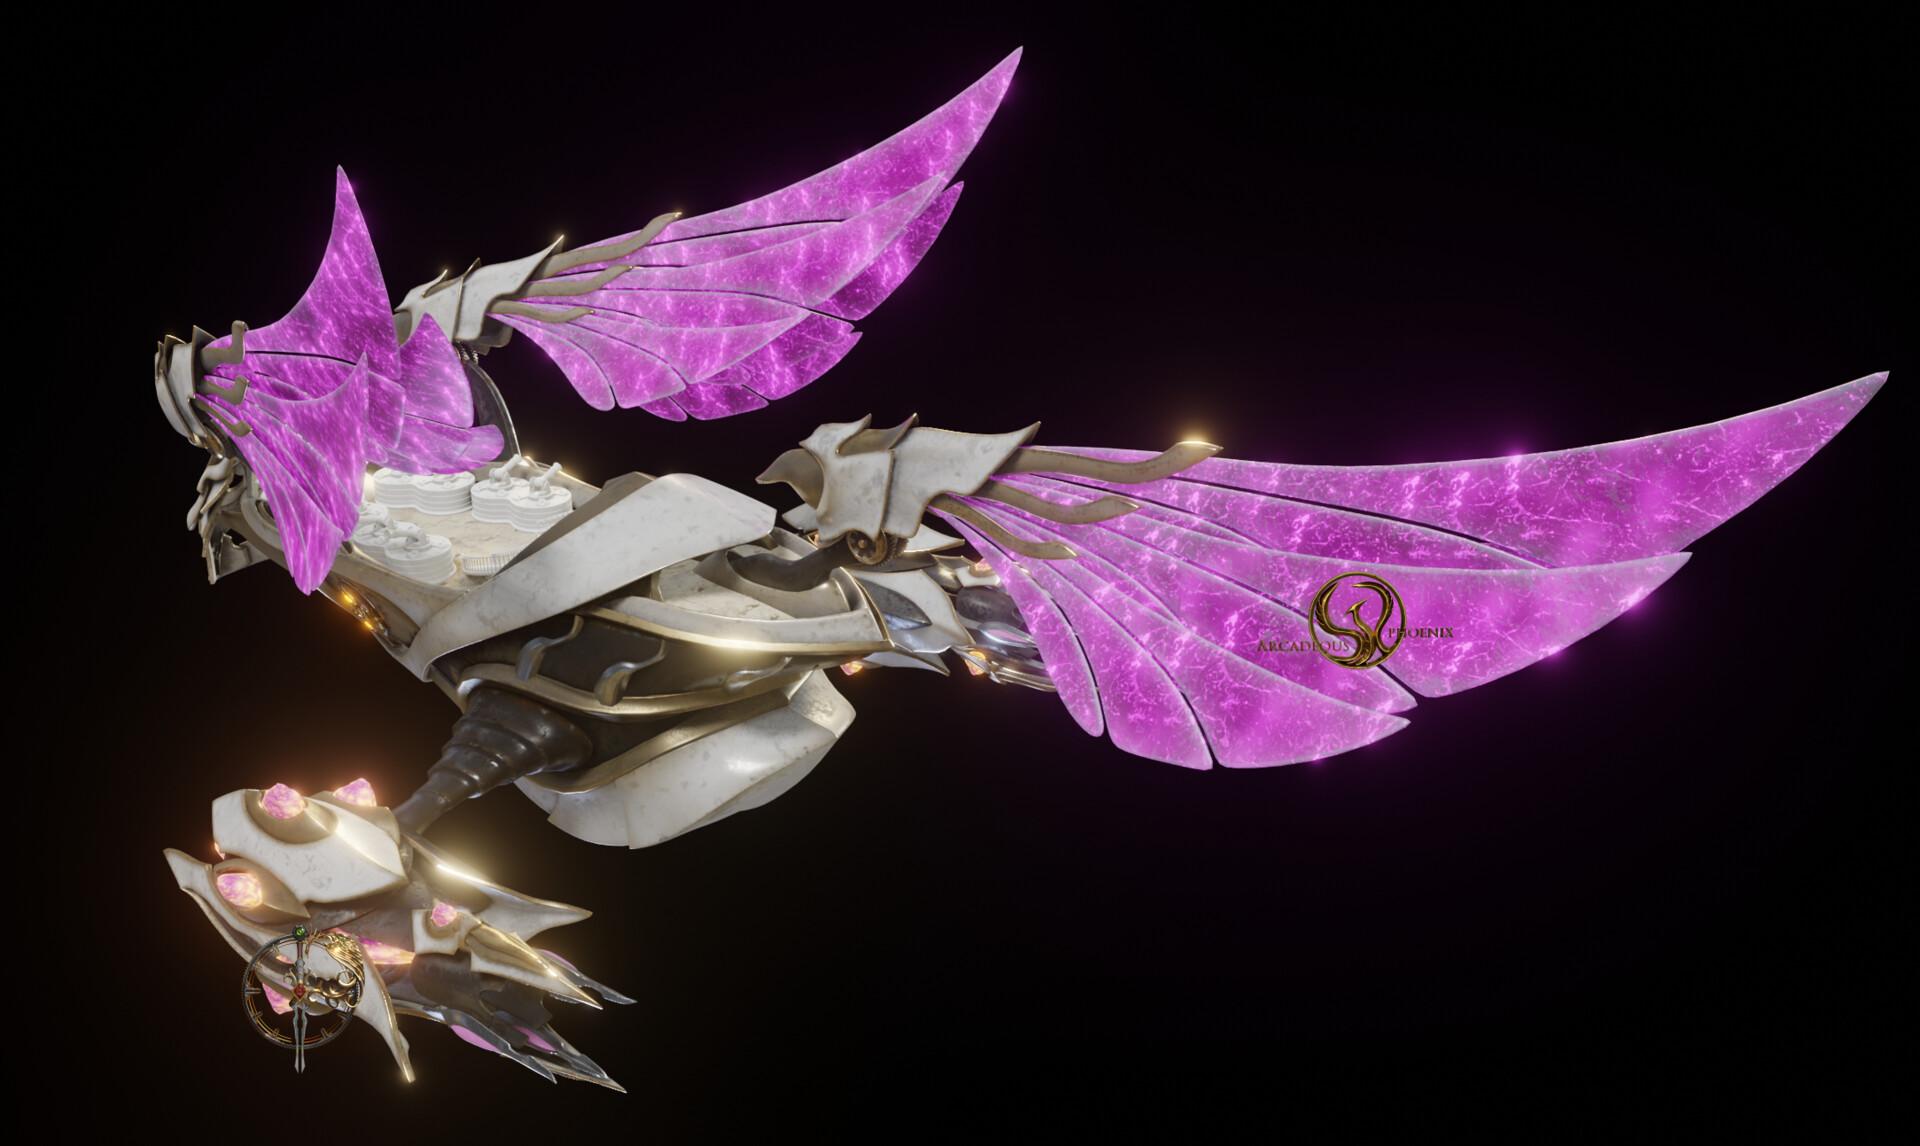 Arcadeous phoenix pd4